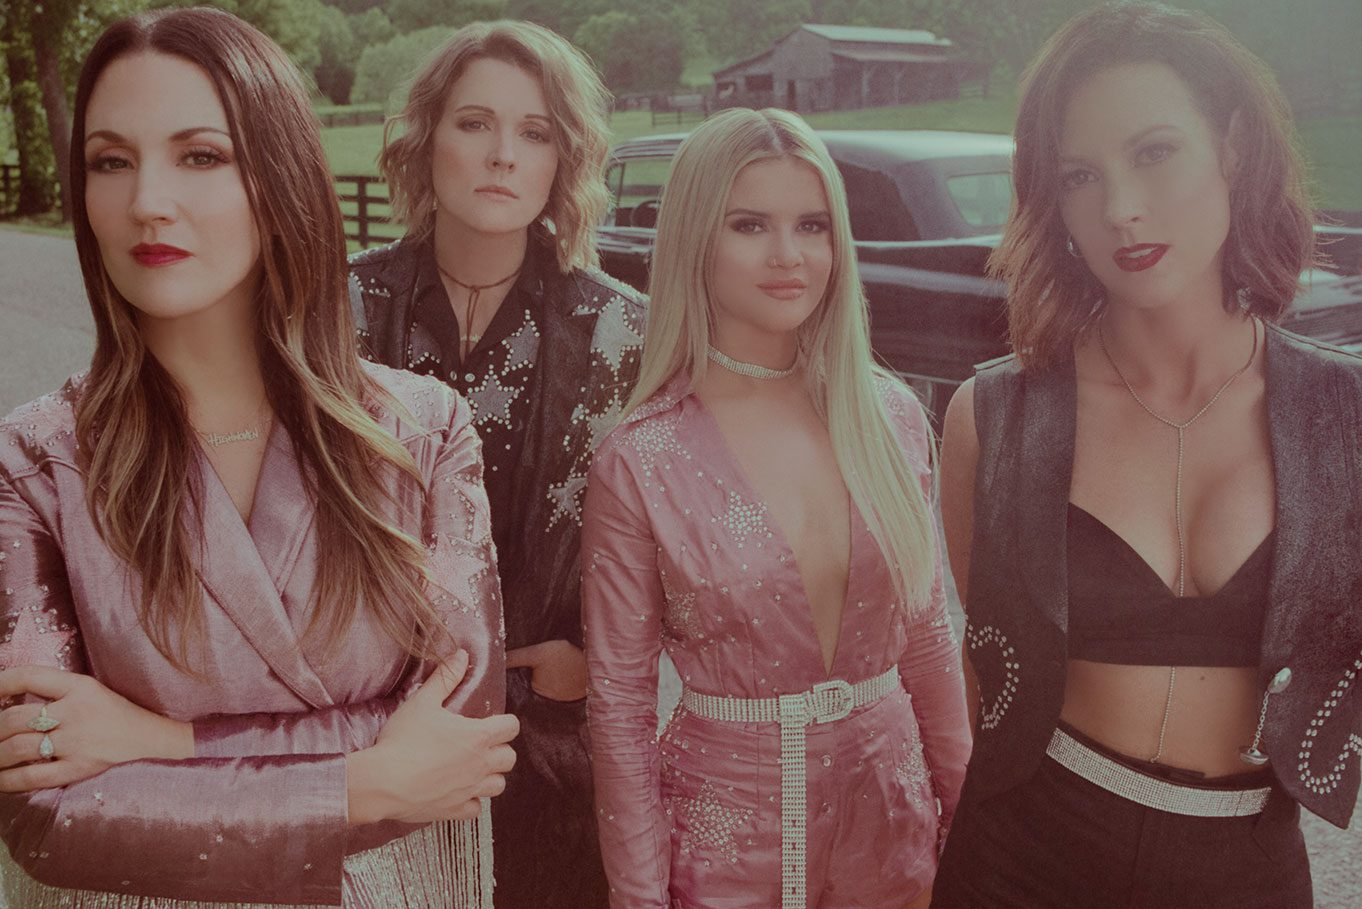 The Highwomen (left to right, Natalie Hemby, Brandi Carlile, Maren Morris and Amanda Shires)